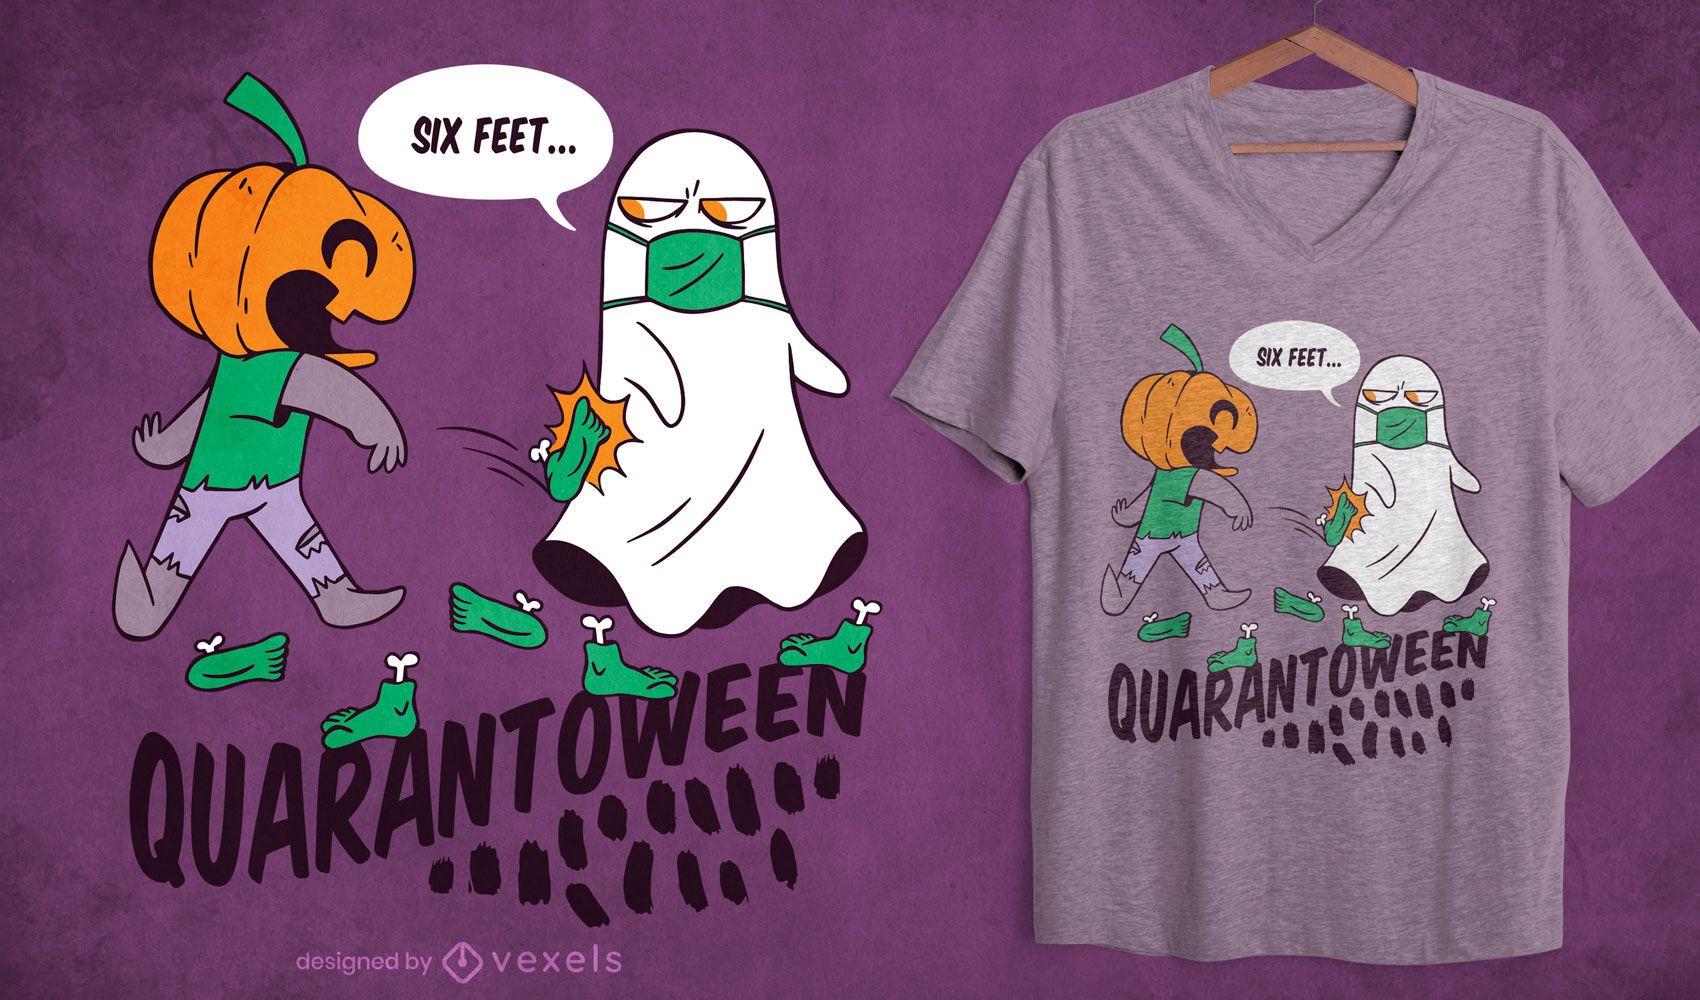 Quarantoween t-shirt design